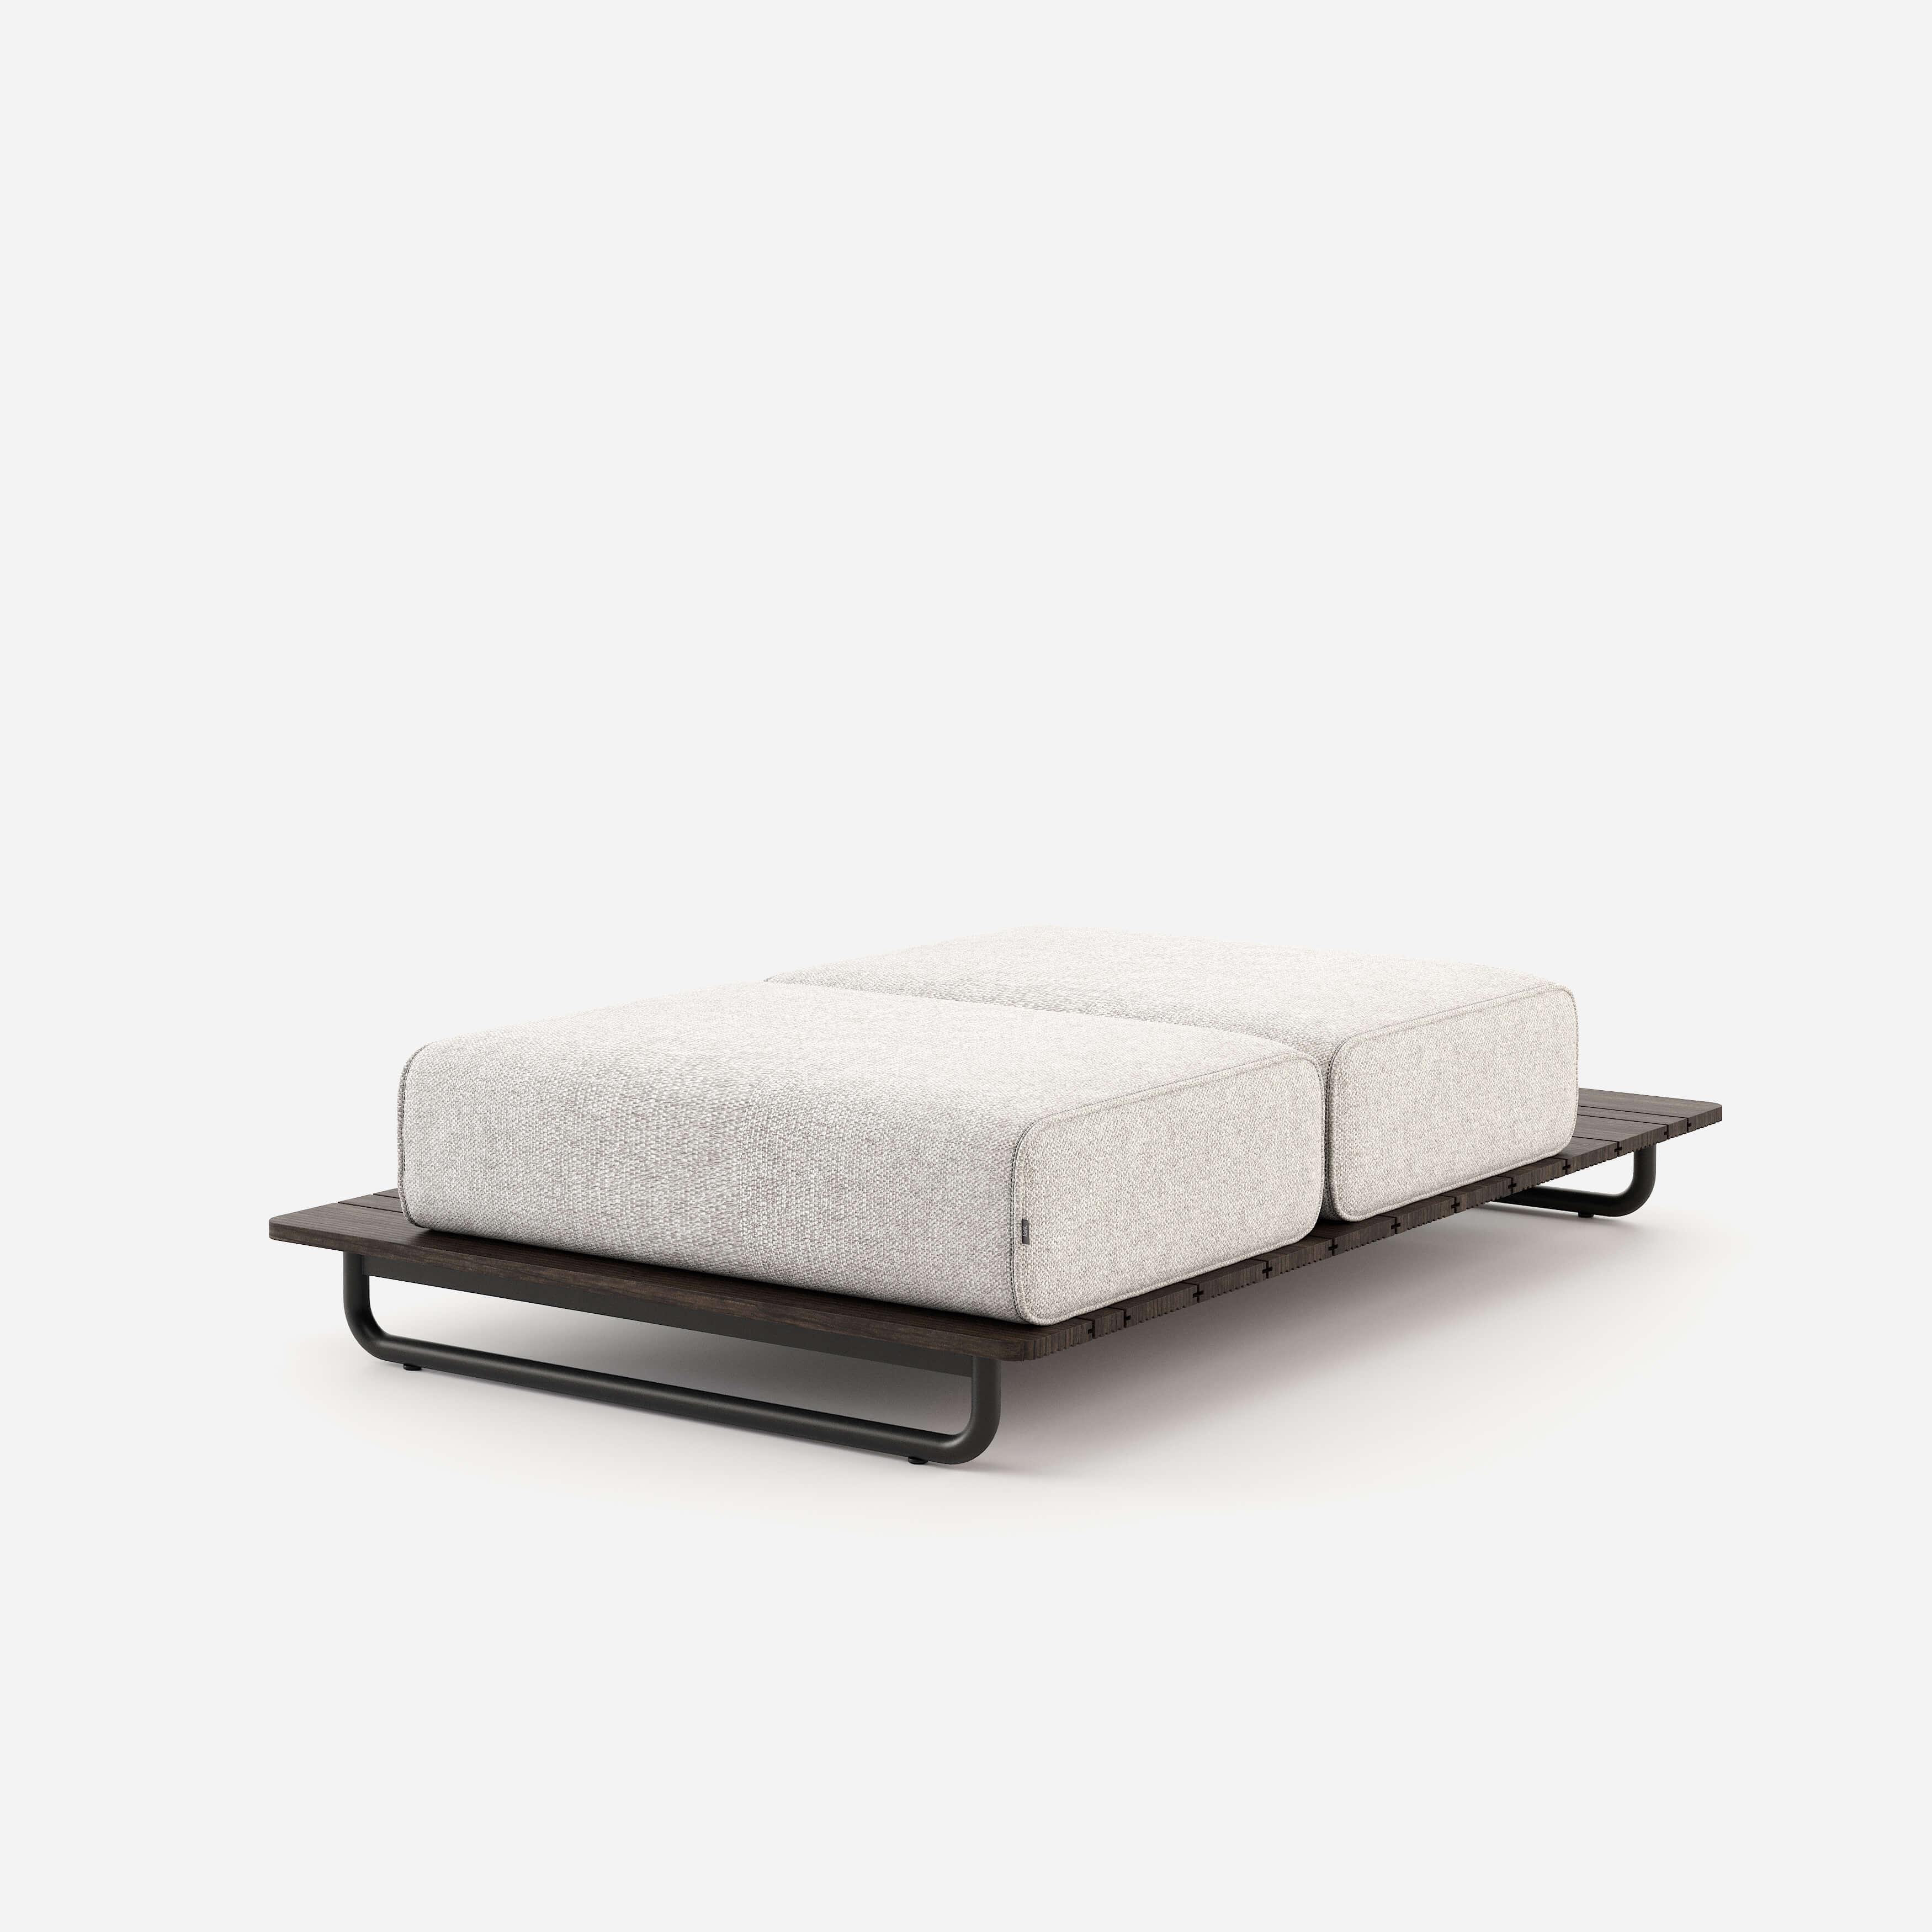 Pouf-copacabana-exterior-collection-domkapa-furniture-interior-design-upholstery-4